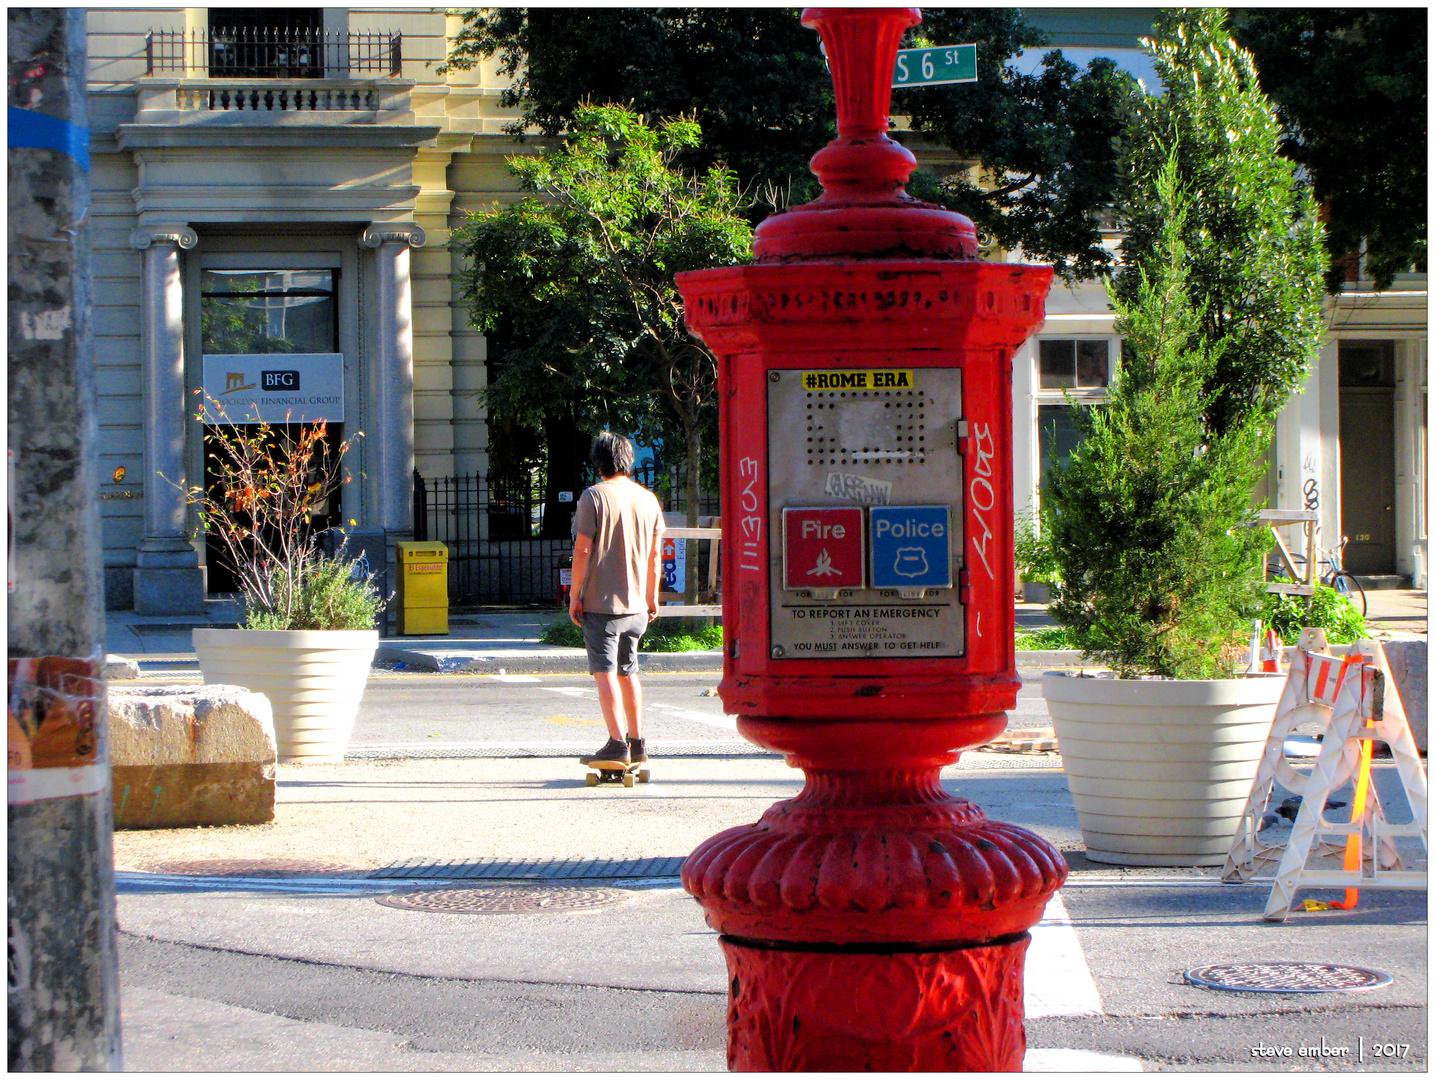 Skateboarder and Callbox - A Williamsburg Moment